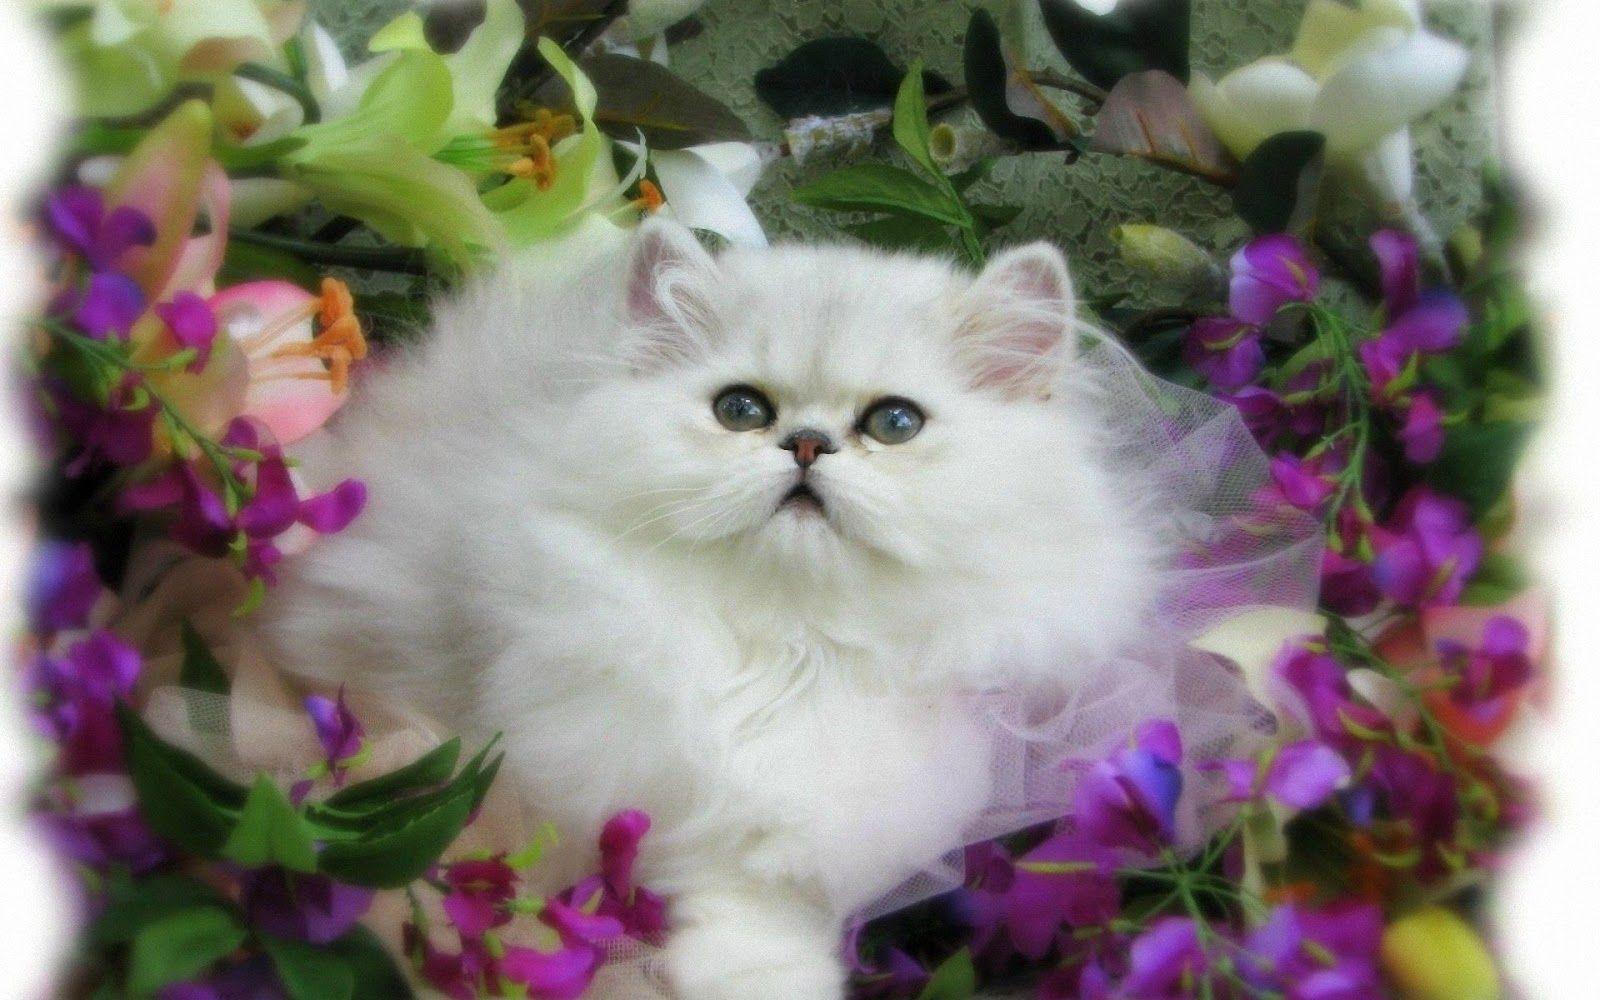 Download Wallpaper Kucing Imut Wallppapers Gallery Cat Flowers Animals Wallpaper